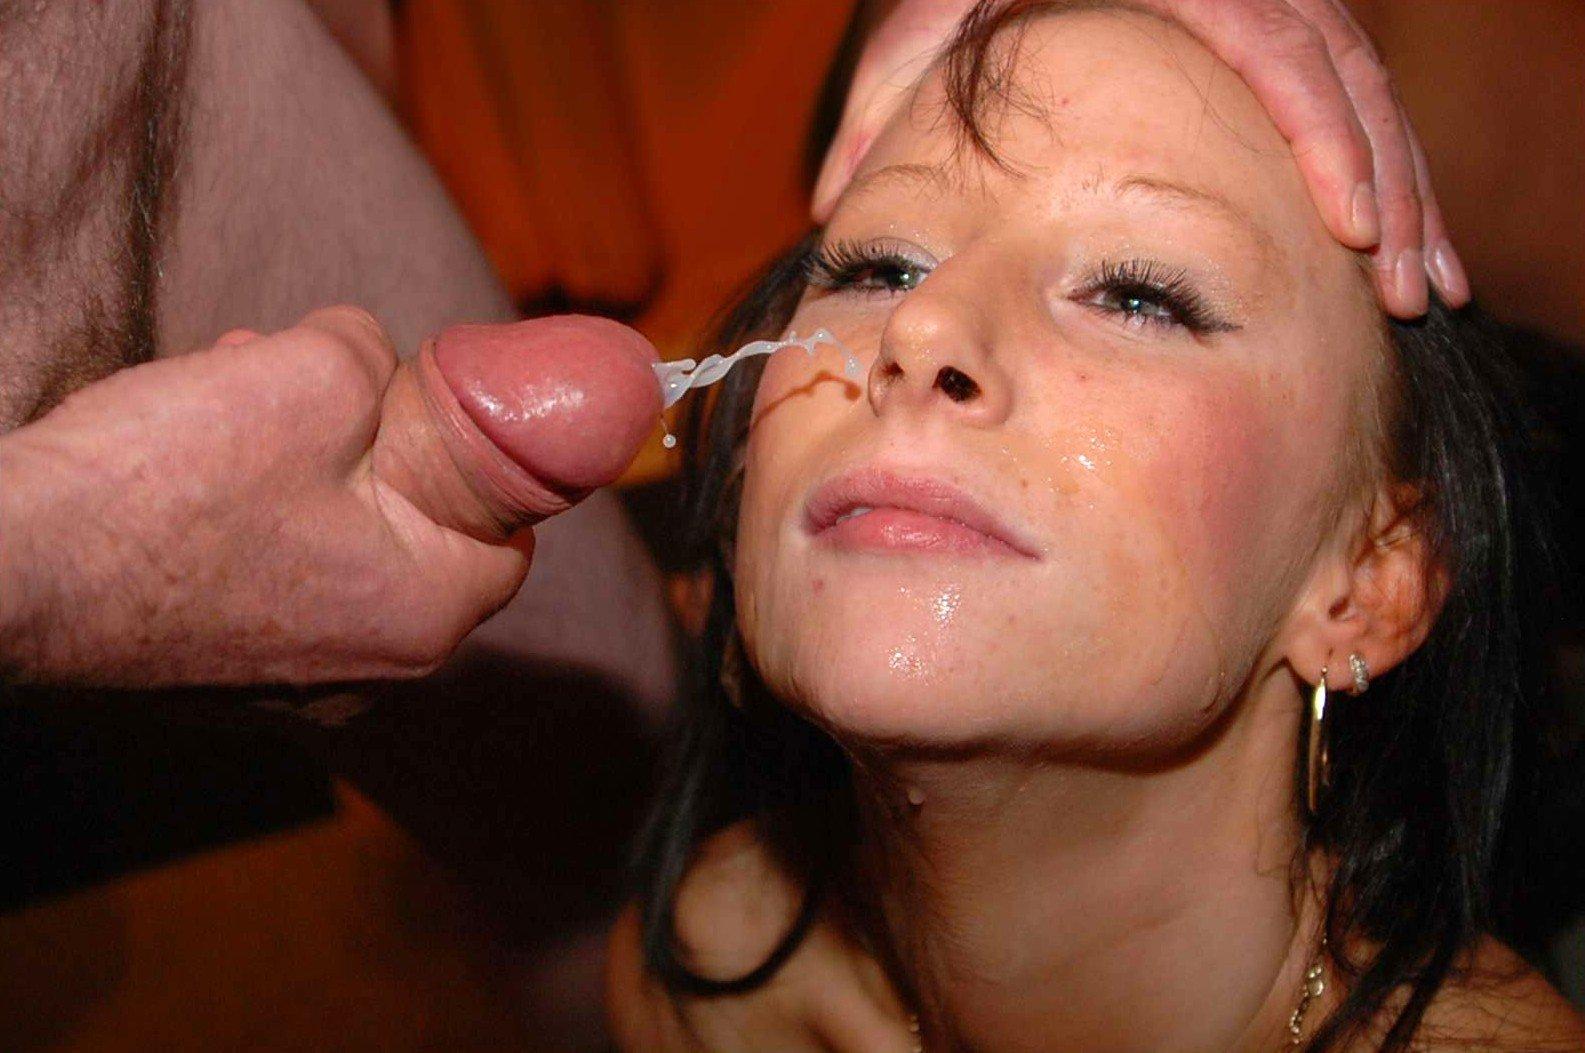 Free surprise cumshot porn pics